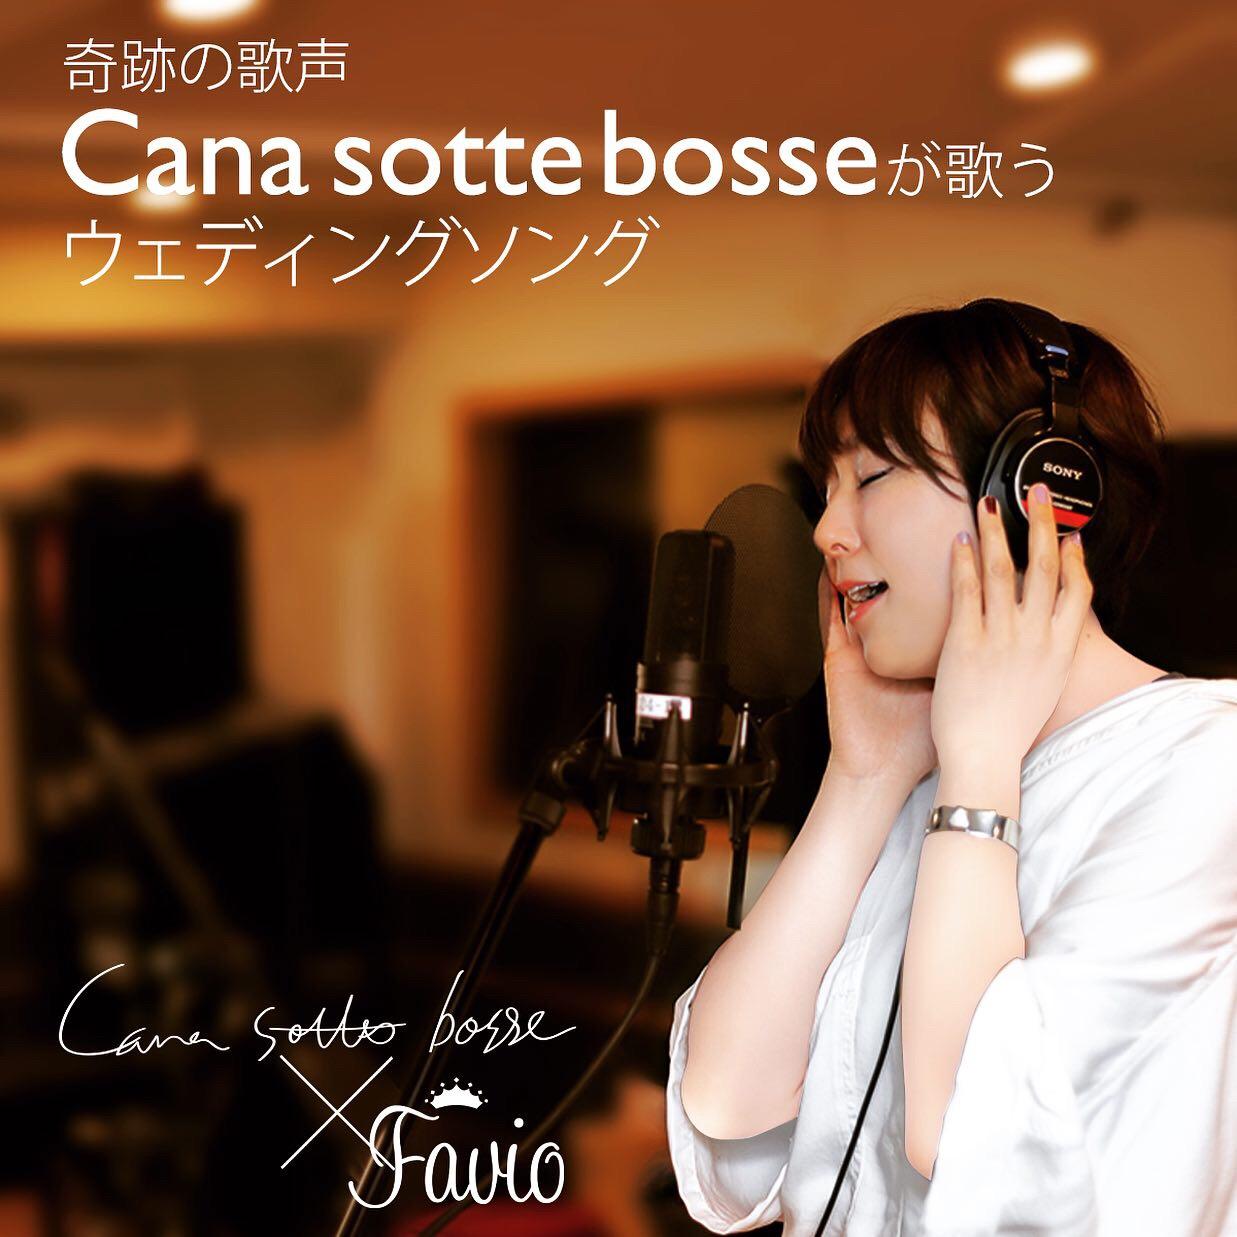 Cana sotte bosseとFavioウェディングムービーがコラボ